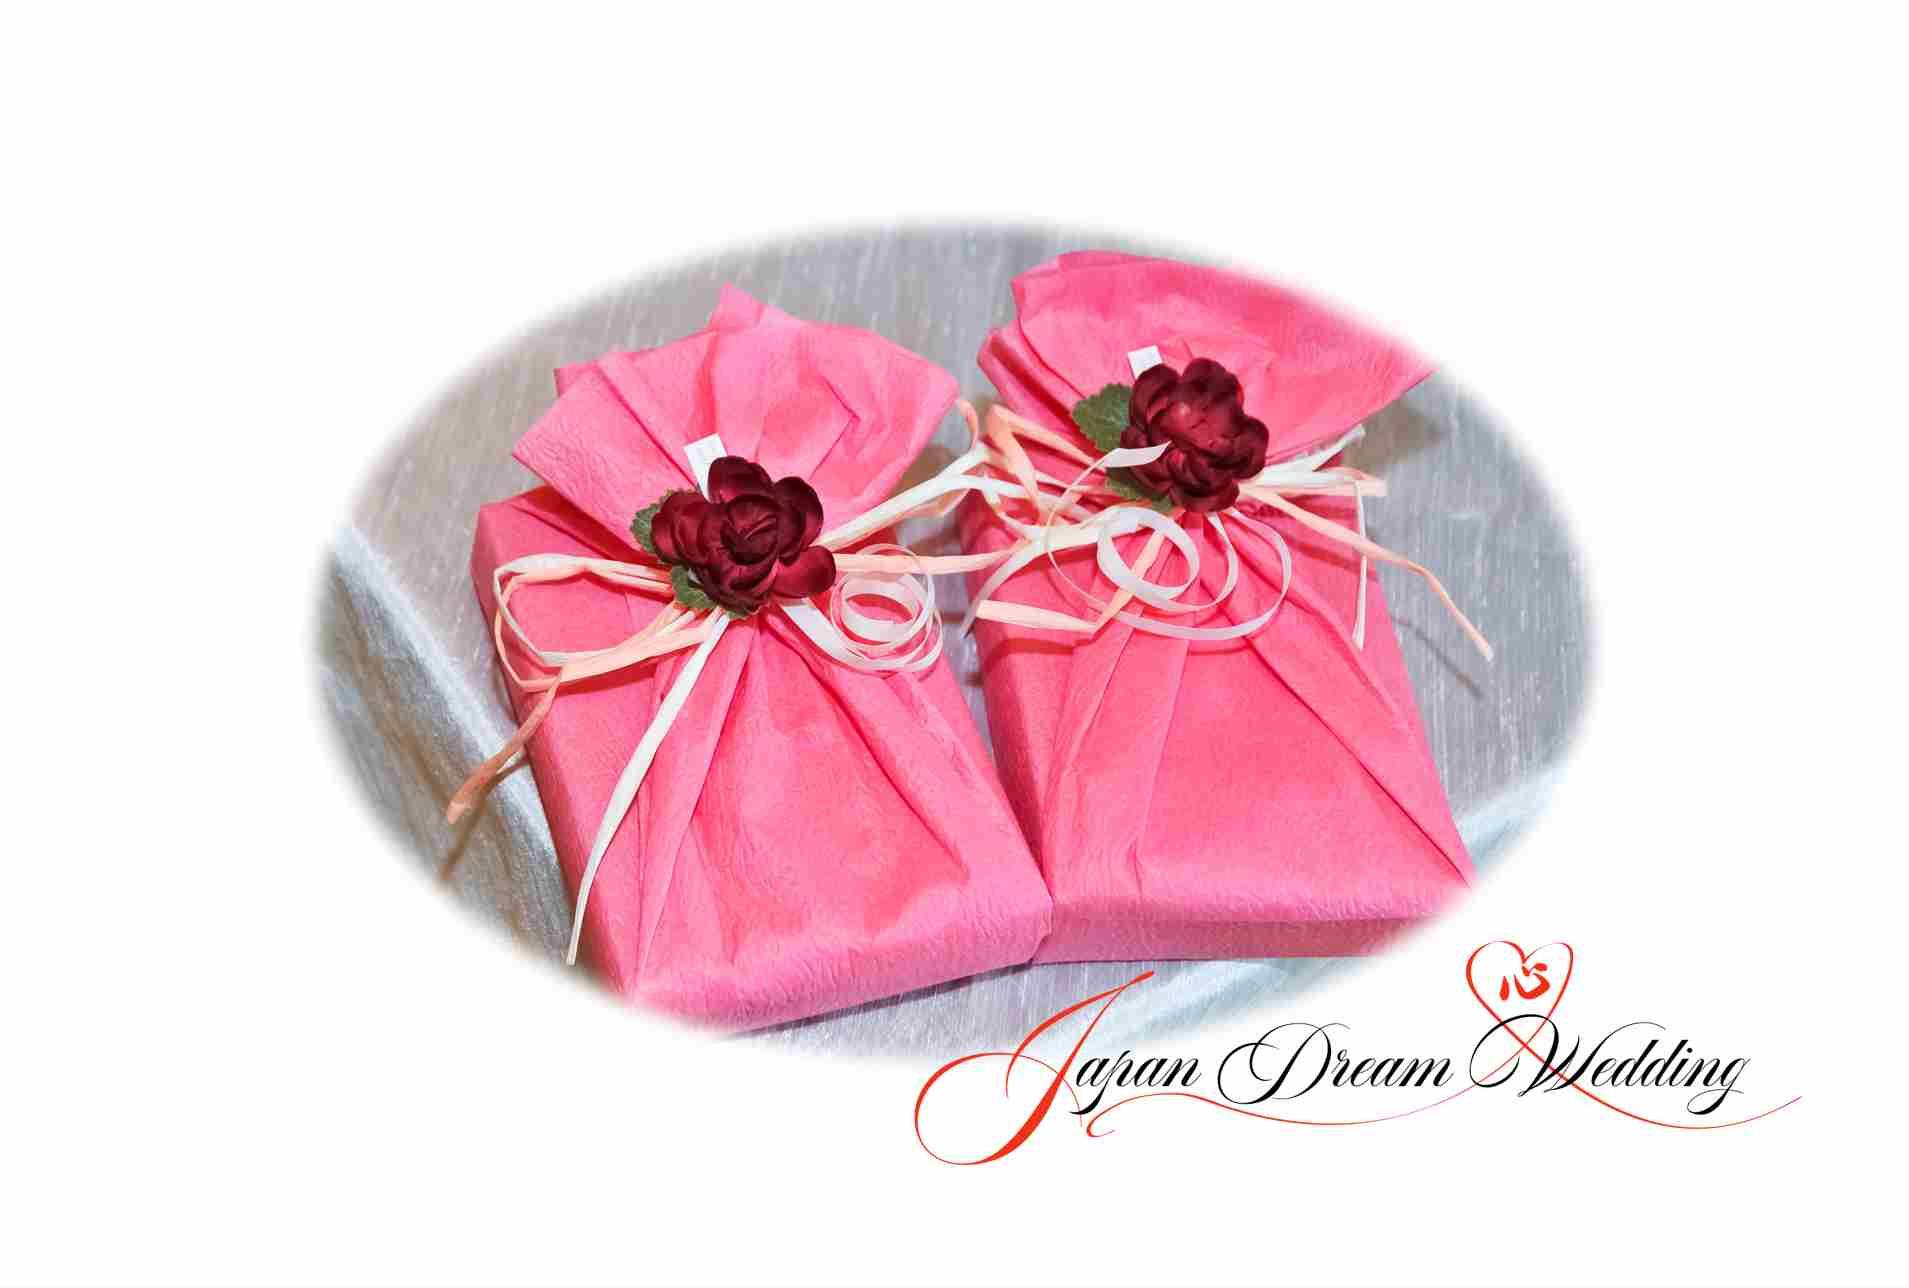 Japan Dream Wedding - Wedding Gifts - D112367174